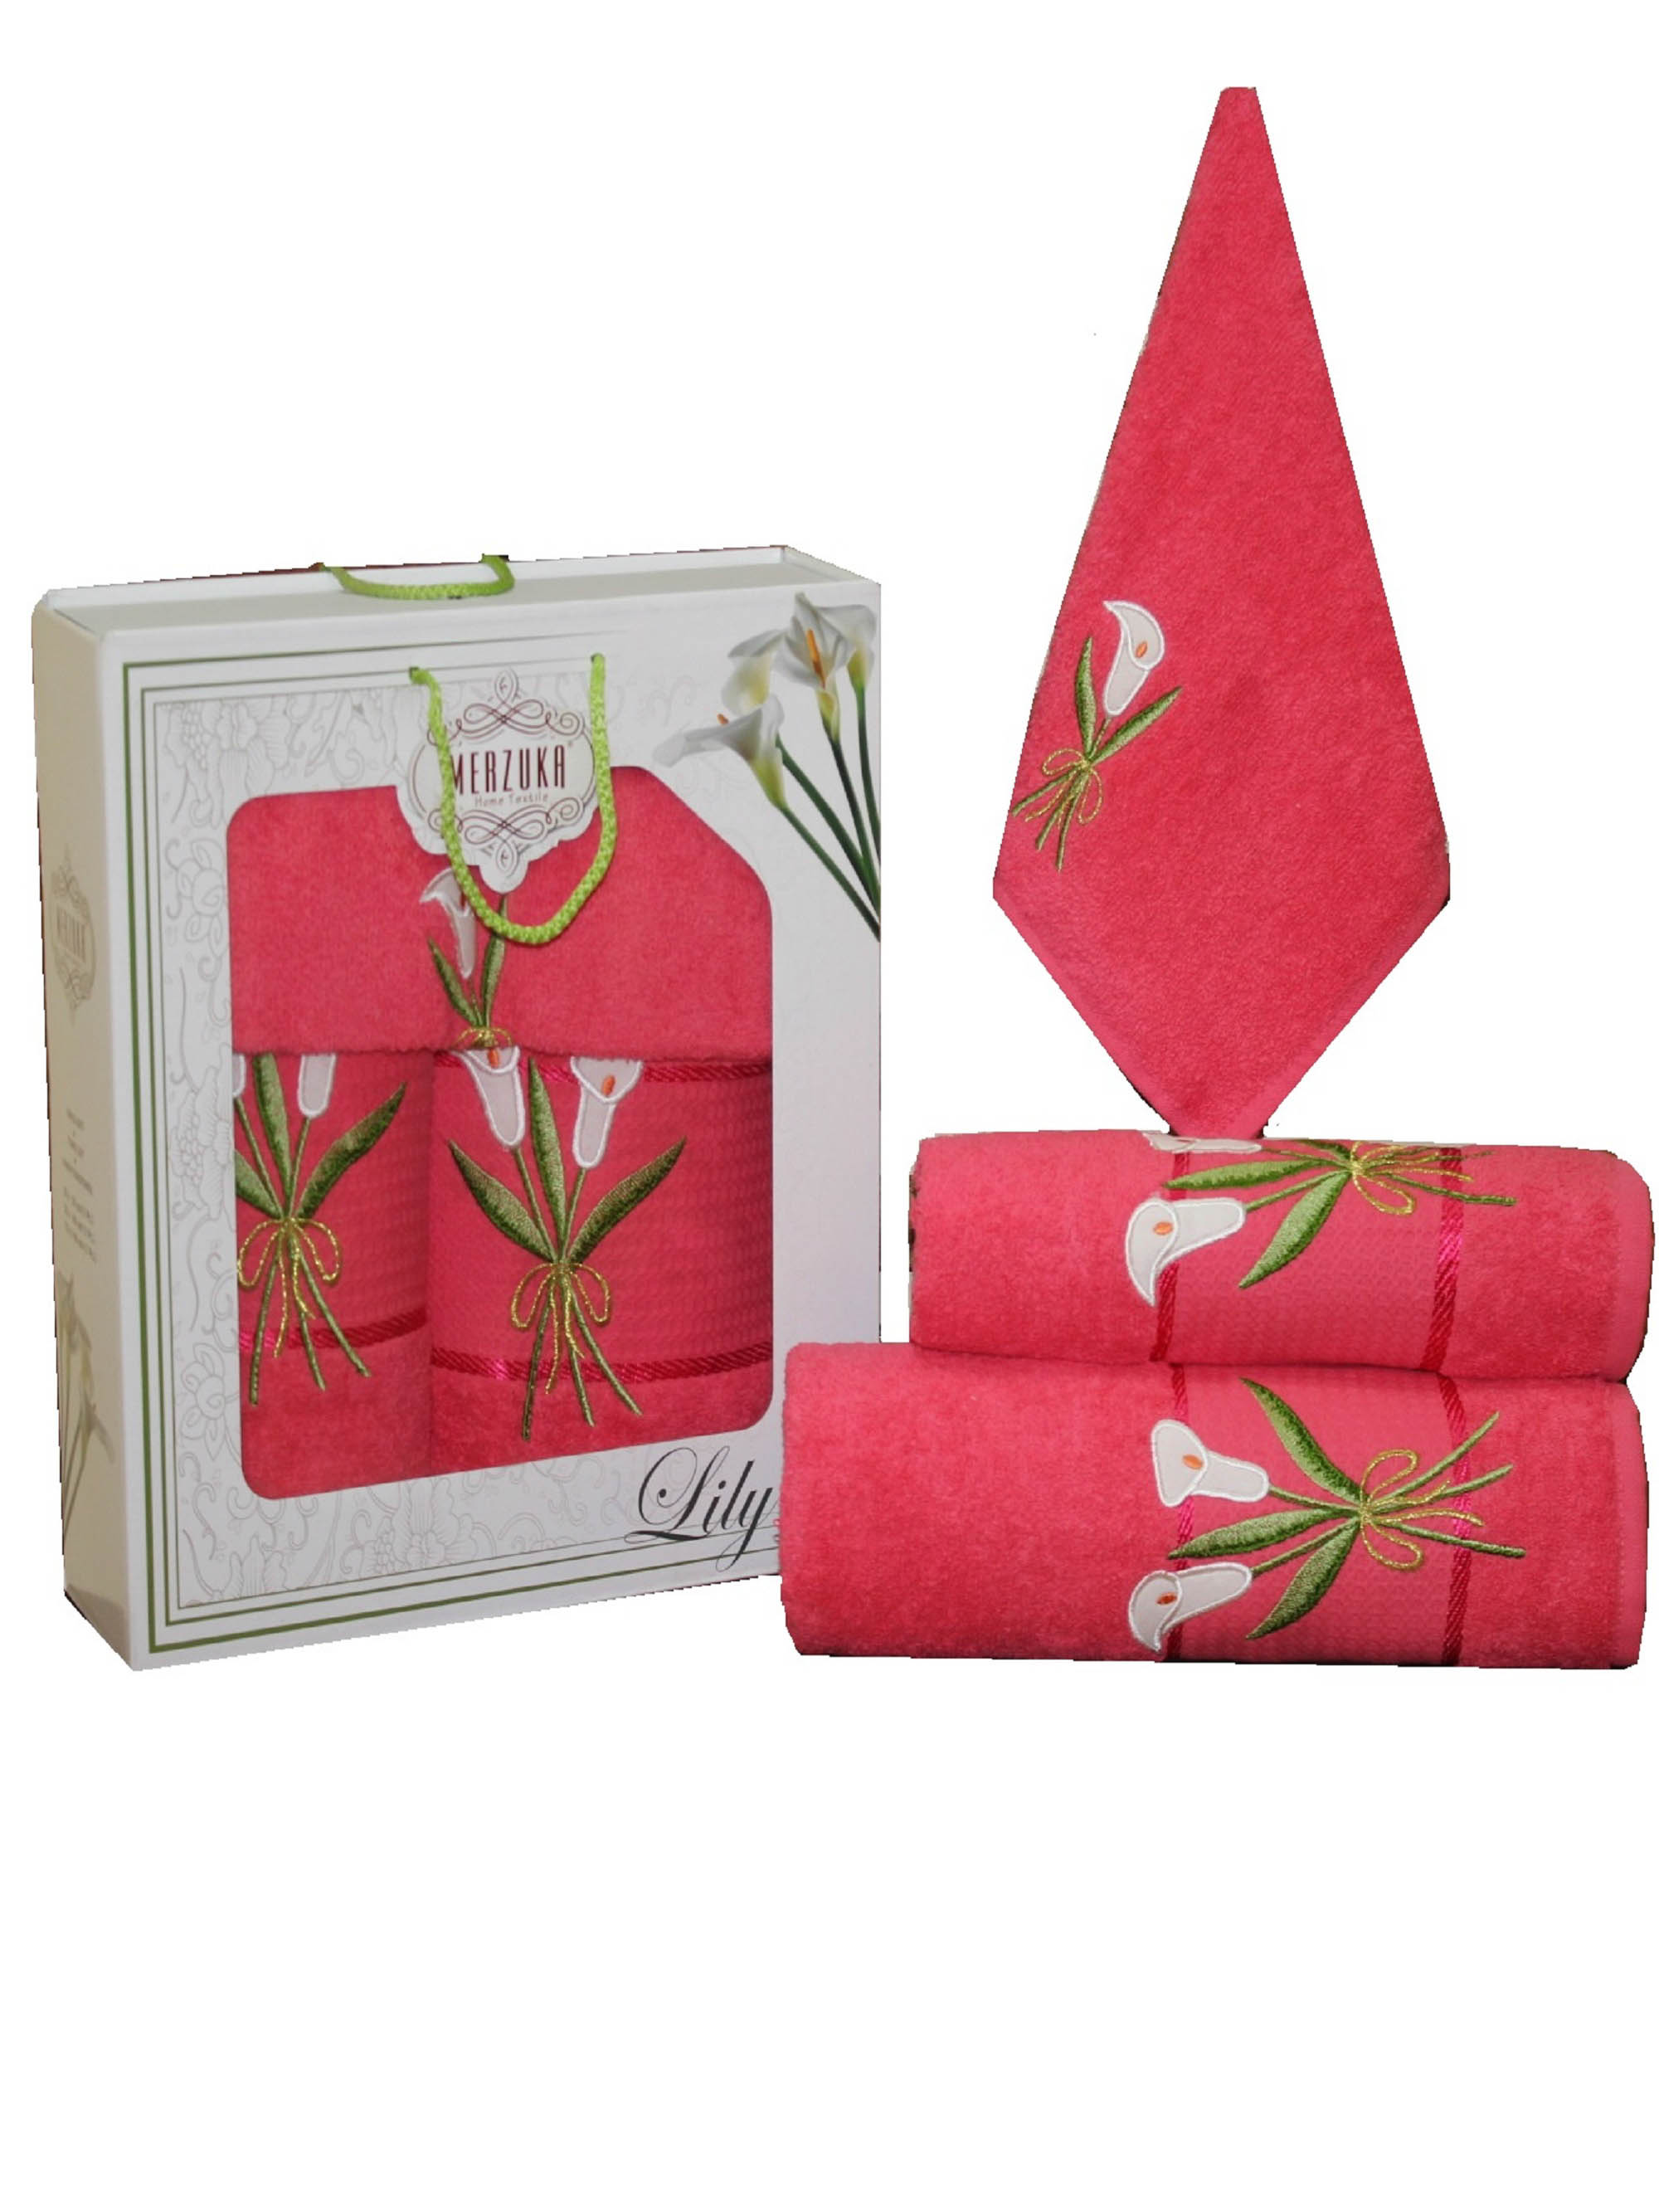 Полотенца Oran Merzuka Набор из 3 полотенец Zambak Цвет: Малиновый набор из 3 полотенец merzuka sakura 50х90 2 70х140 8432 оранжевый